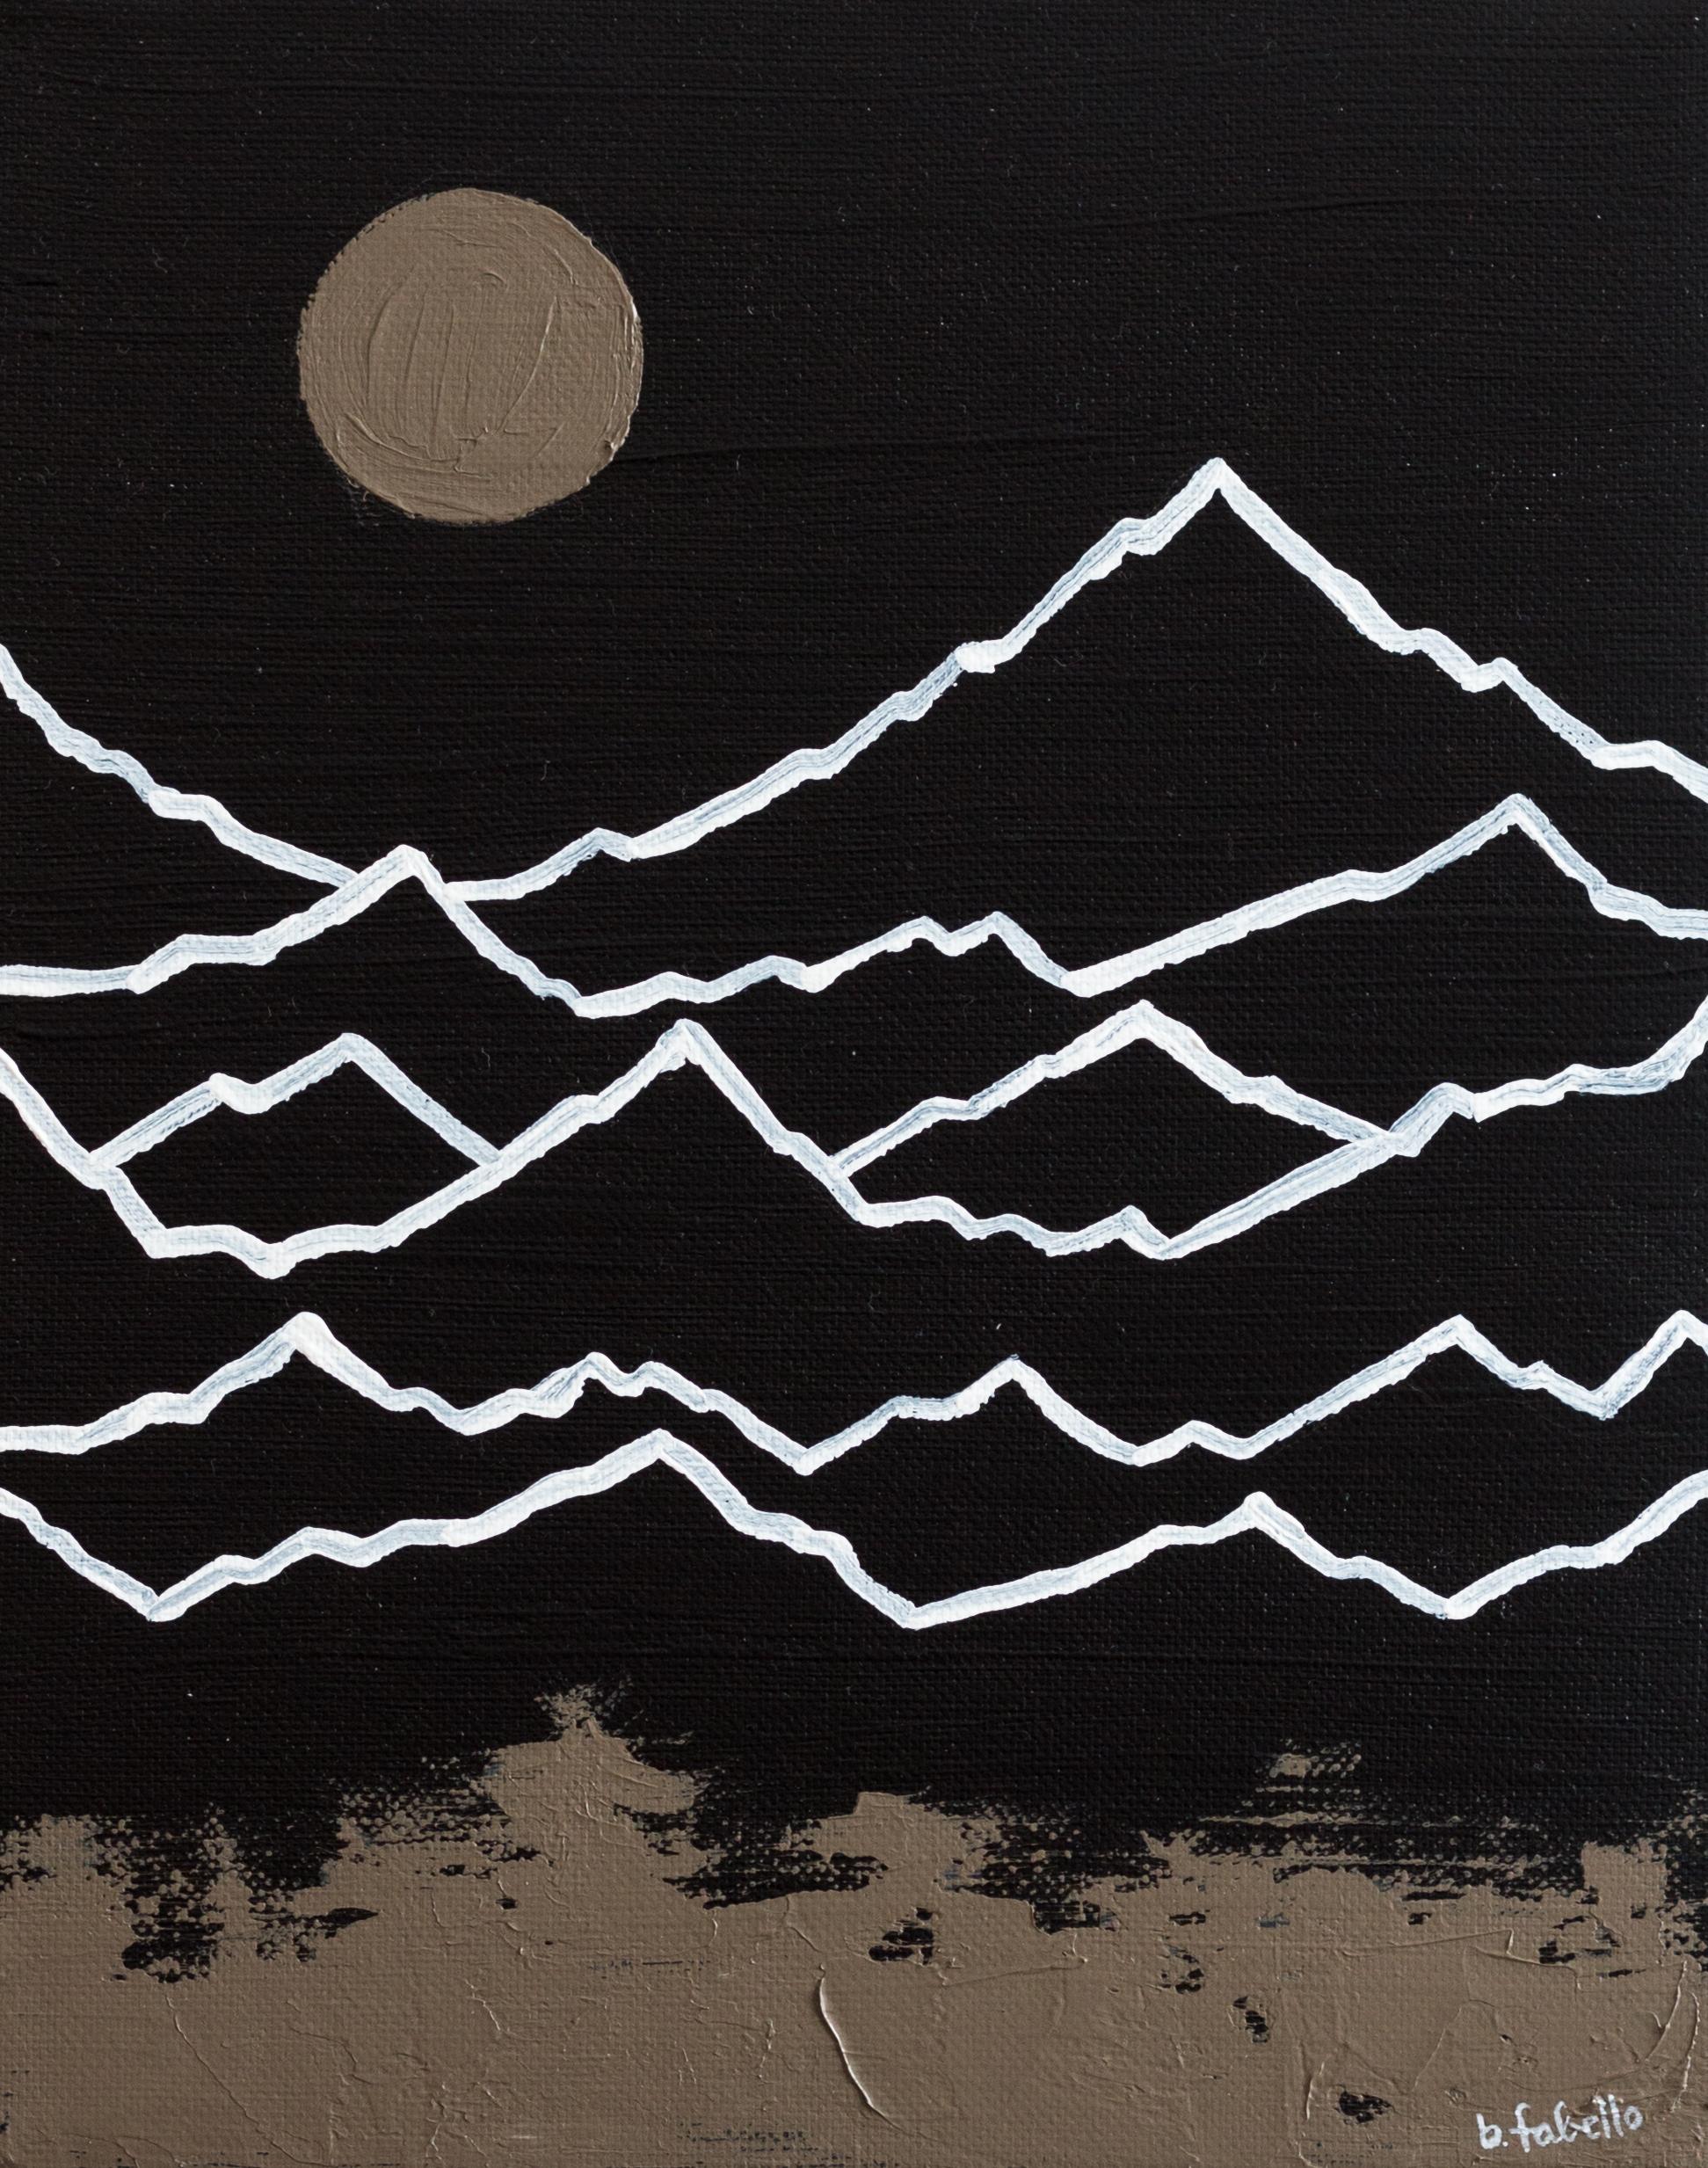 Reflection IV by Britt Fabello